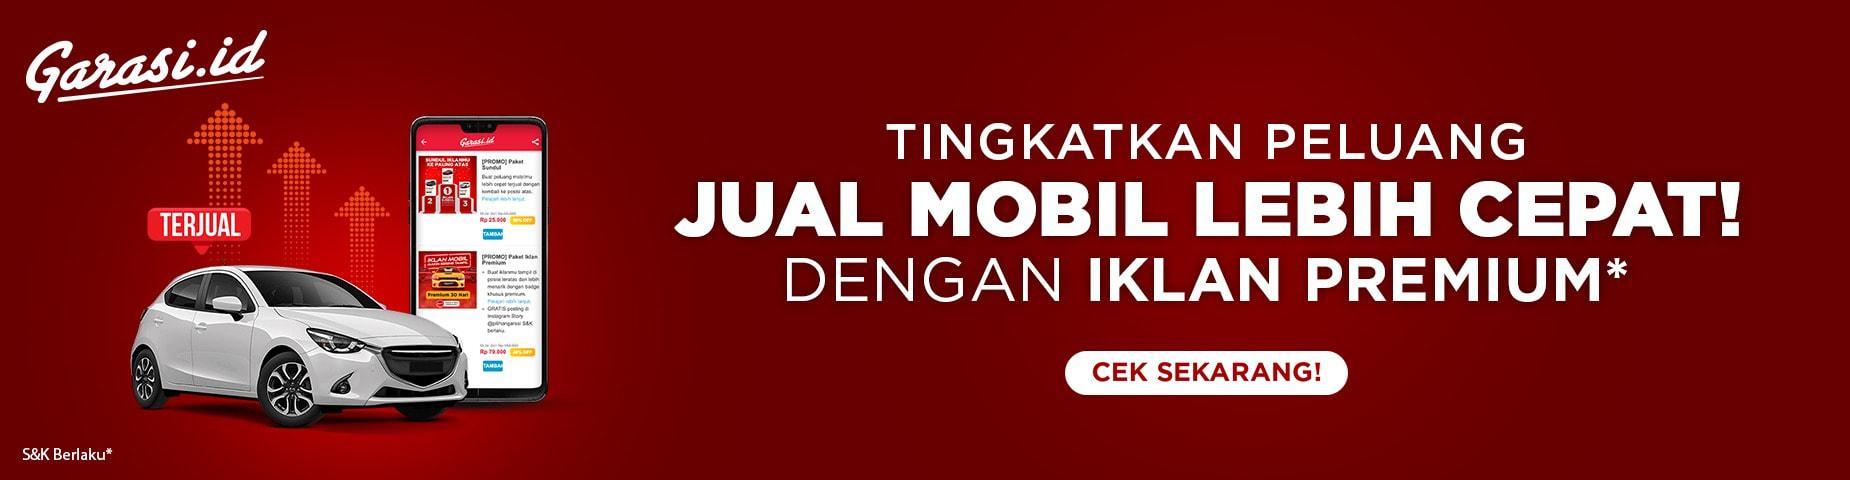 Homepage banner - Mobile